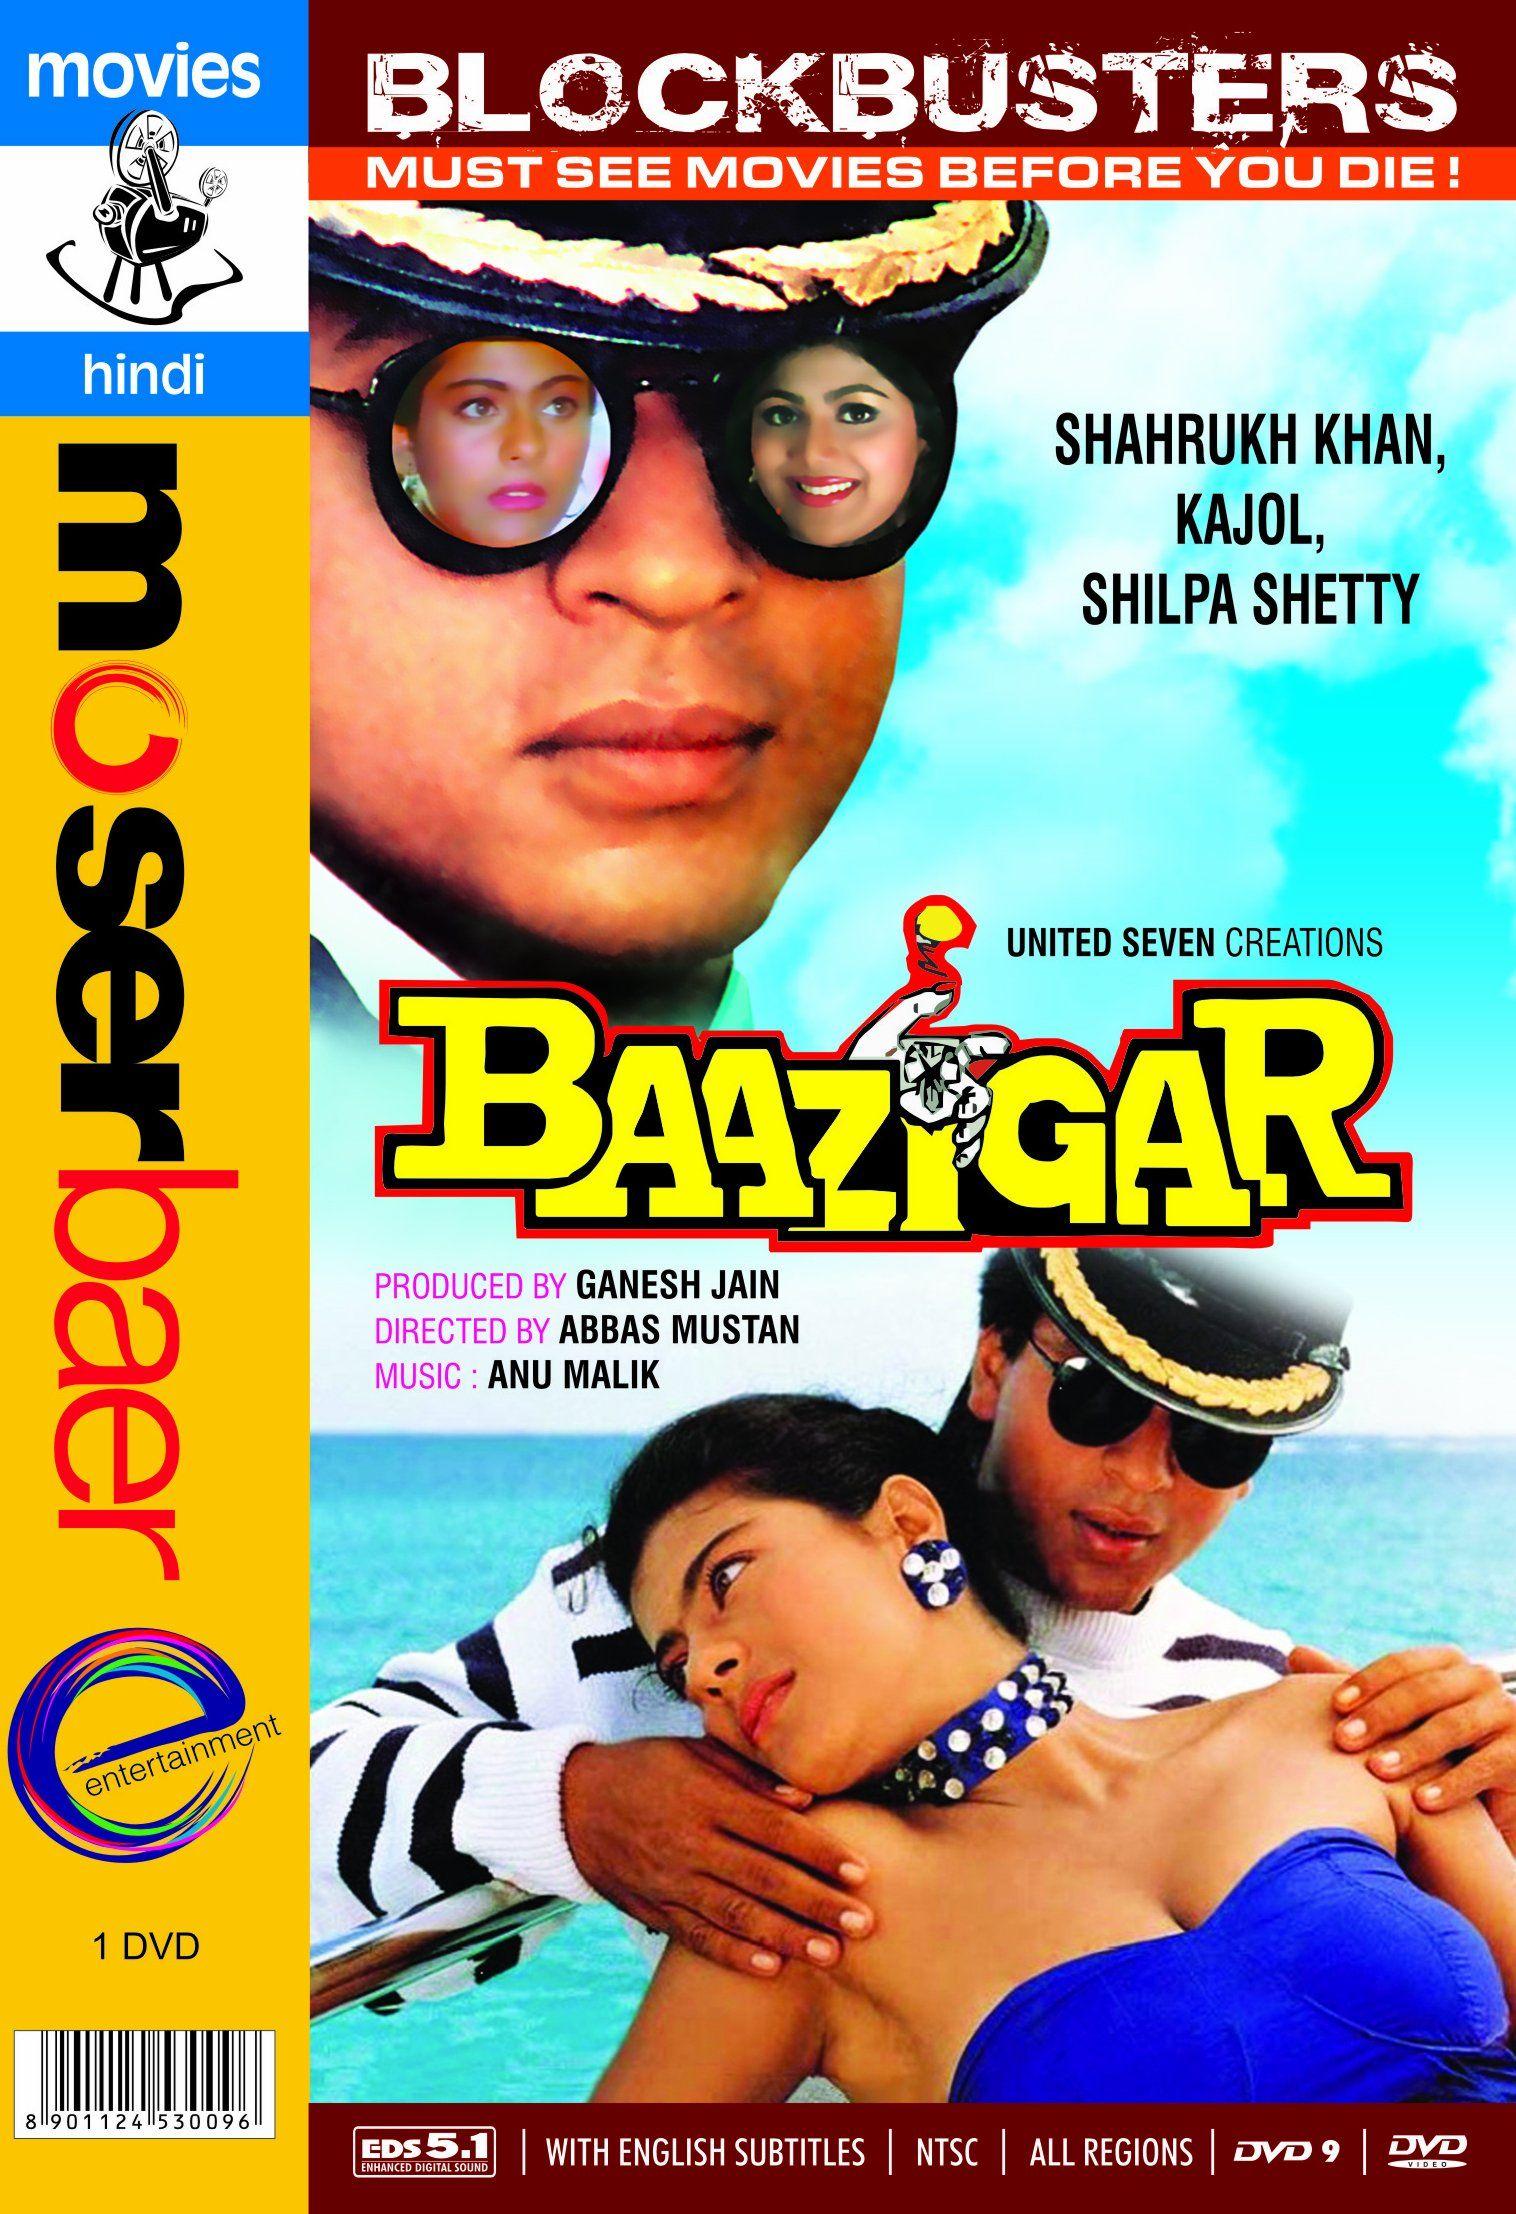 Baazigar Top 10 movies released around Diwali ever